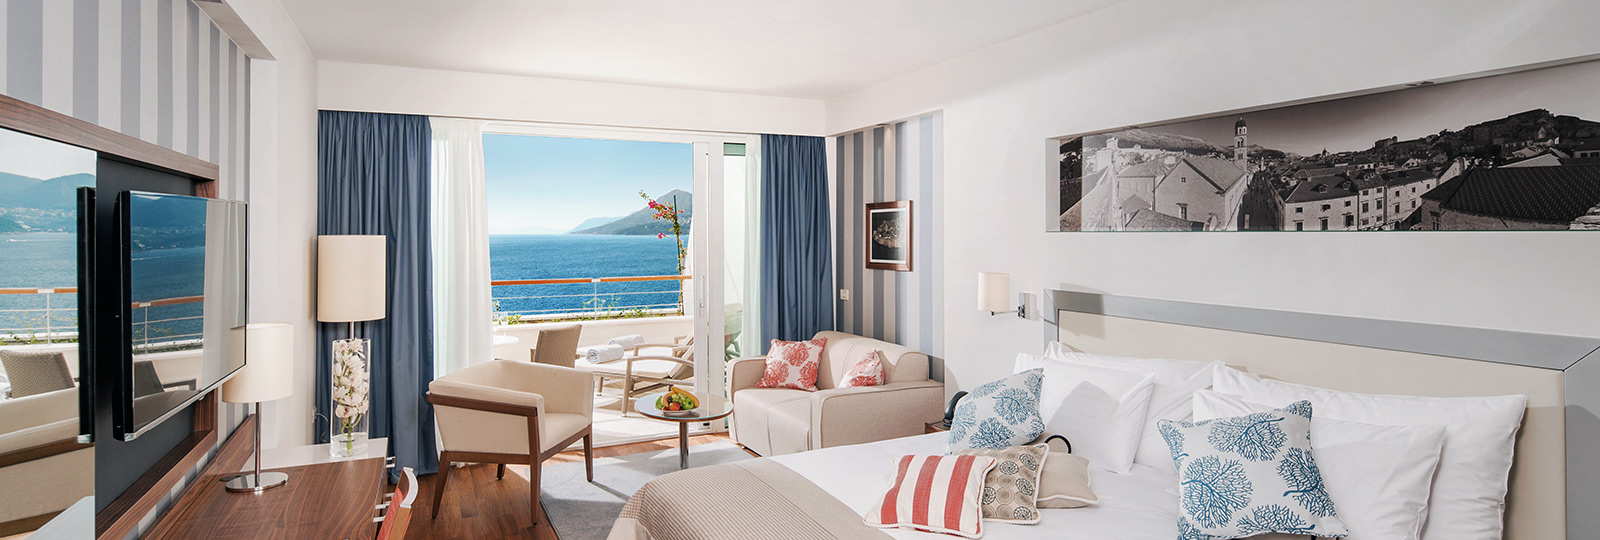 Valamar Dubrovnik President Hotel Croatia